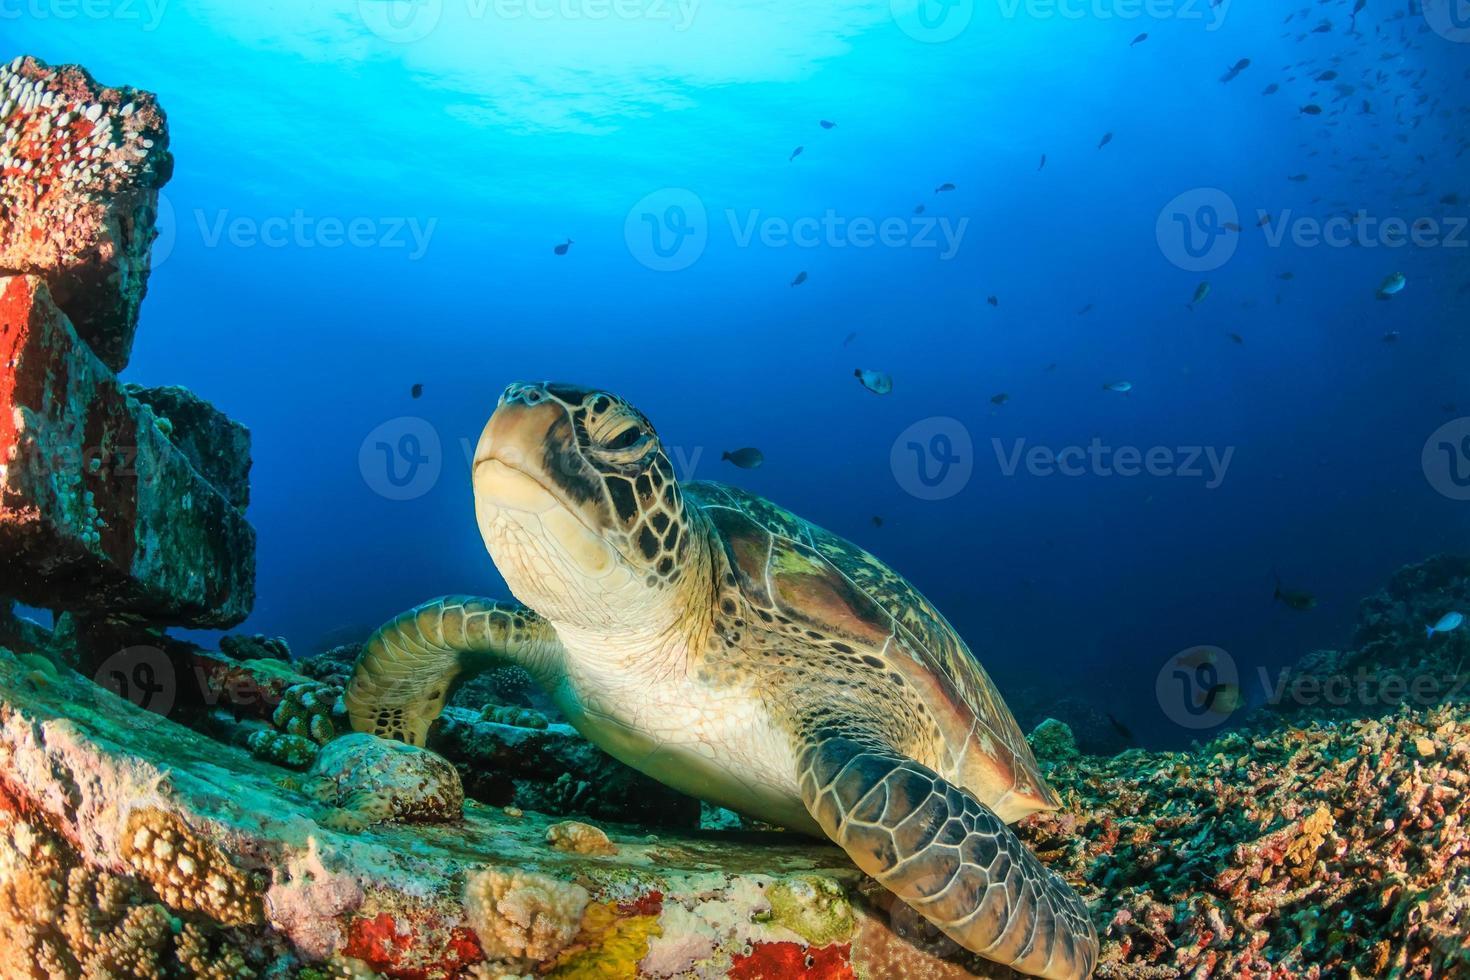 tortuga verde en un arrecife artificial foto